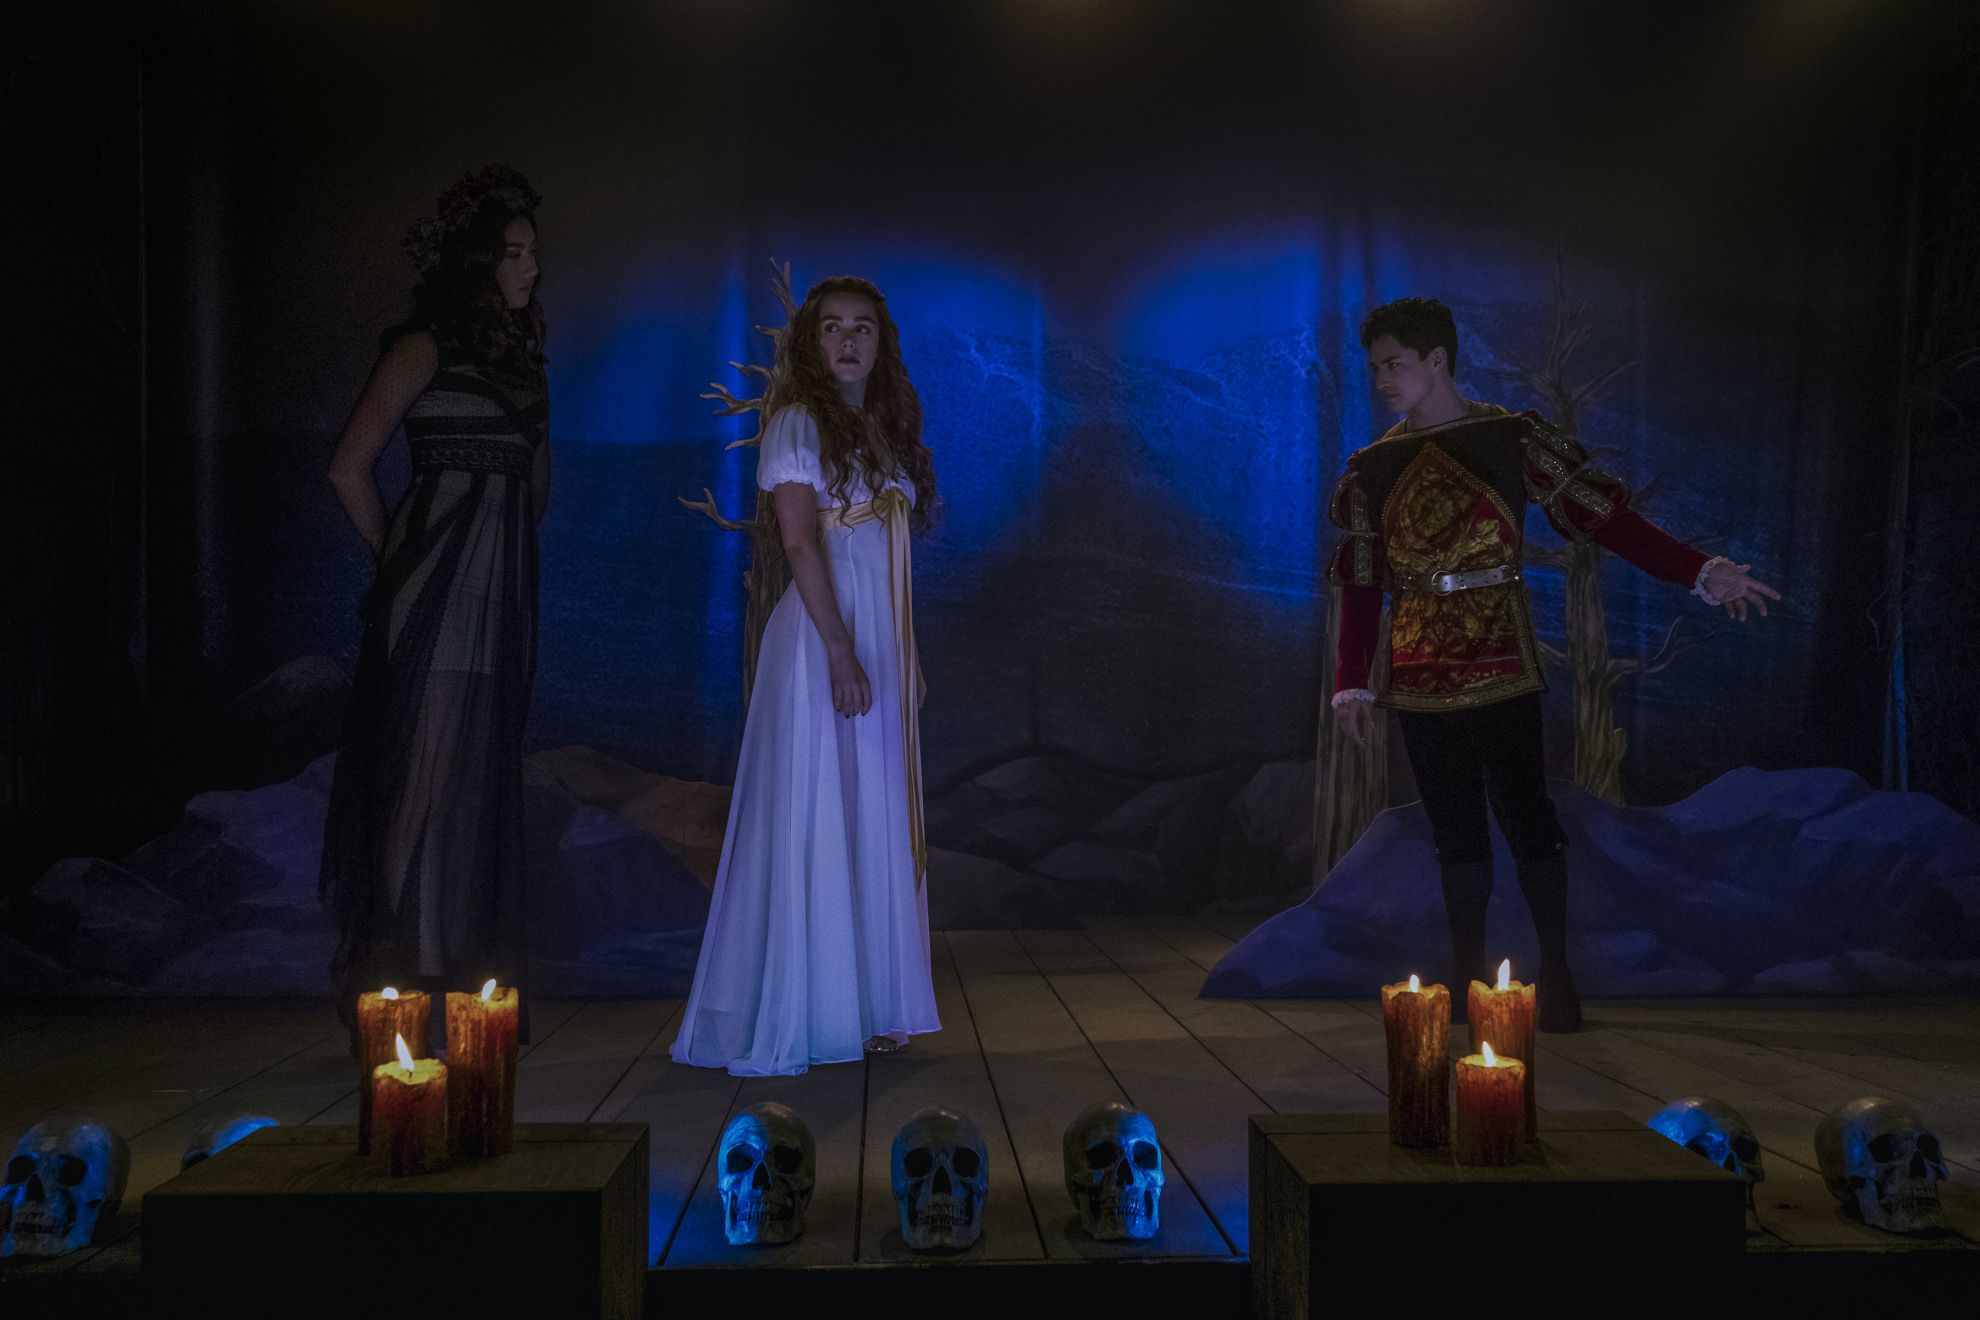 Le terrificanti avventure di Sabrina: Kiernan Shipka insieme a Gavin Leatherwood nella seconda stagione